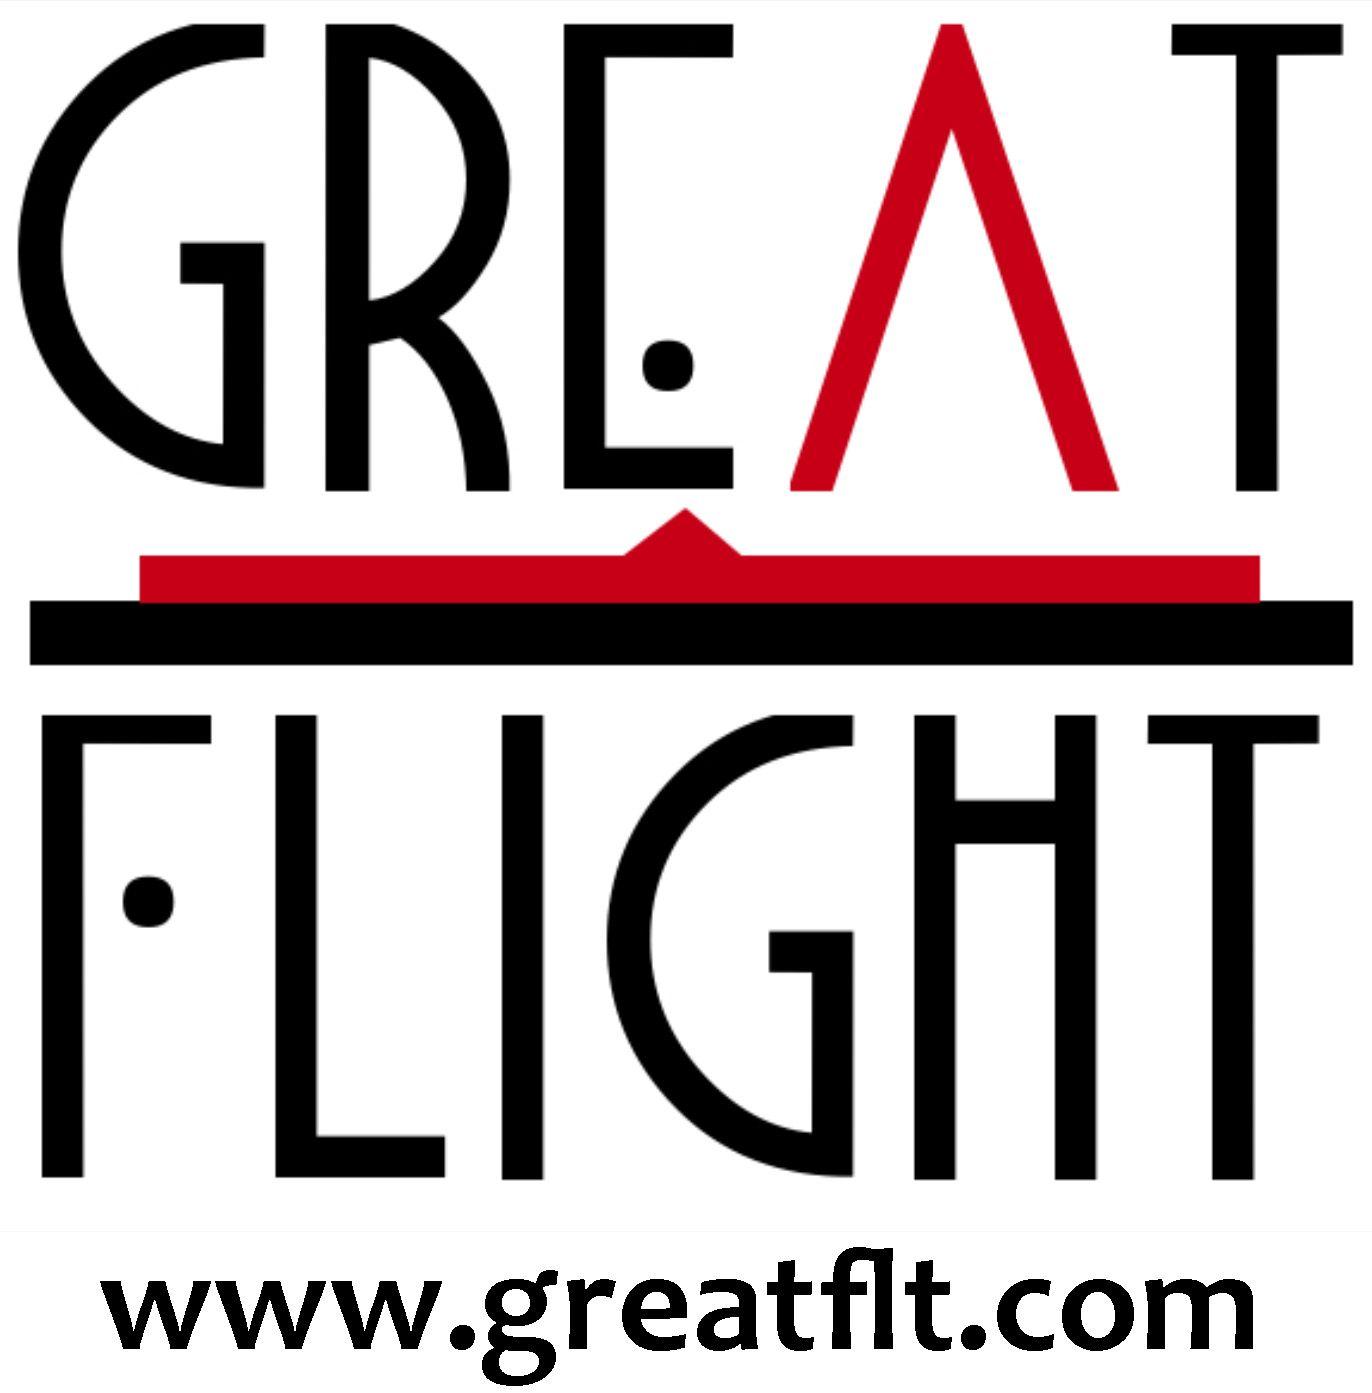 great_flight_logo_with_web_site_address